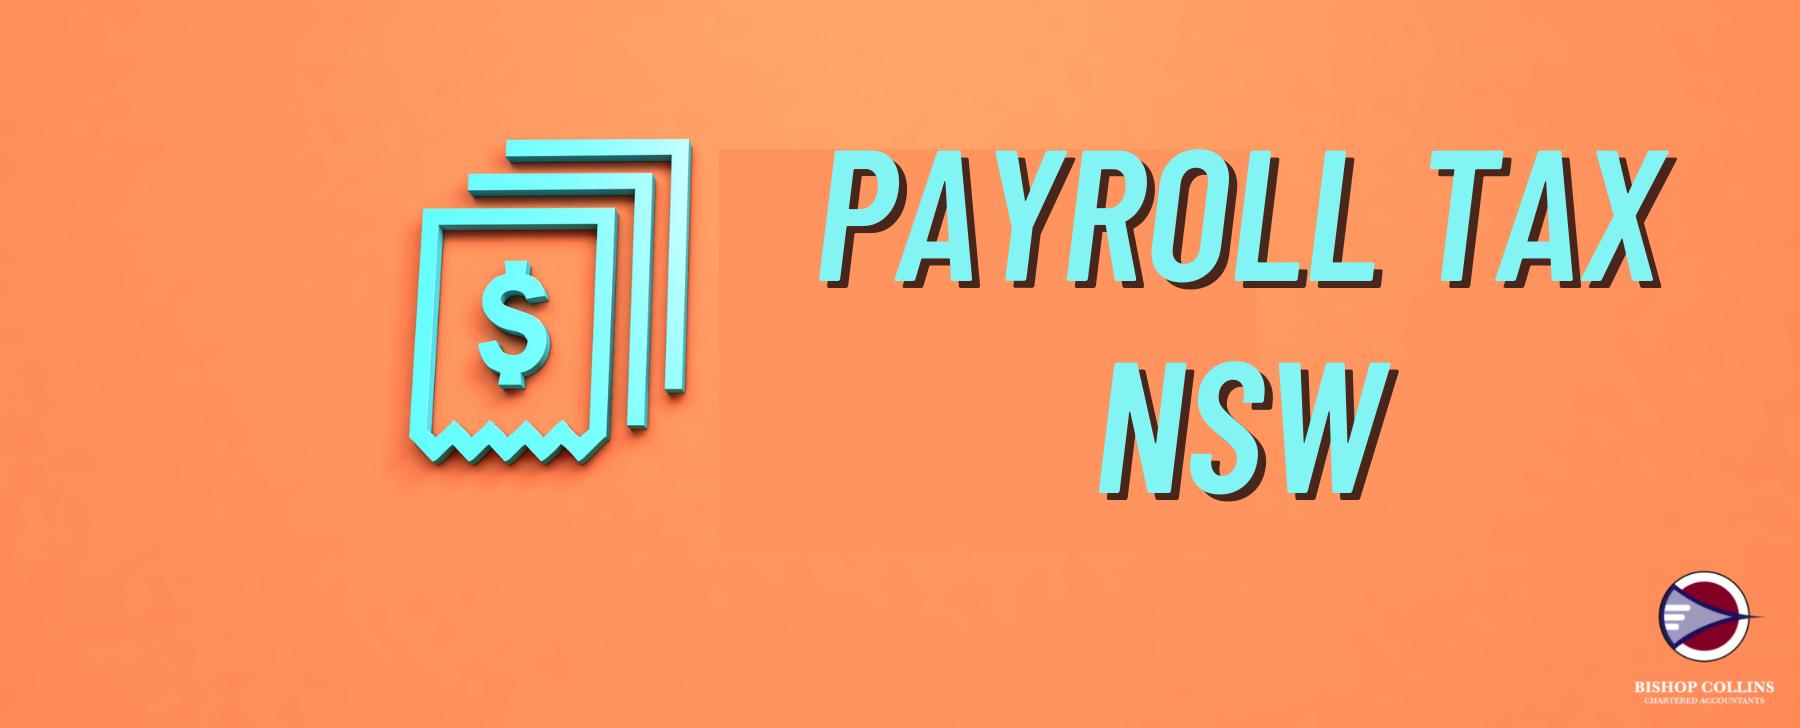 payroll tax nsw on an orange background